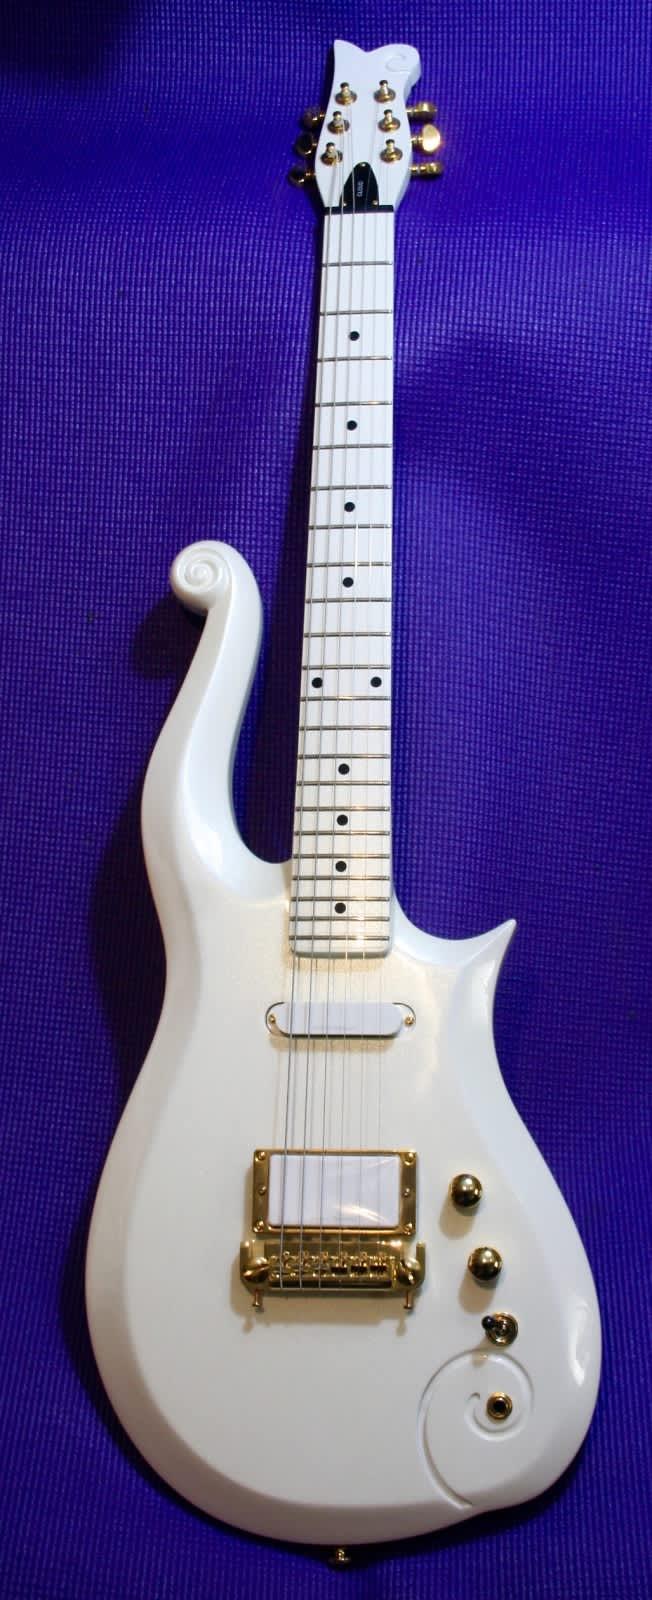 Prince purple rain cloud guitar